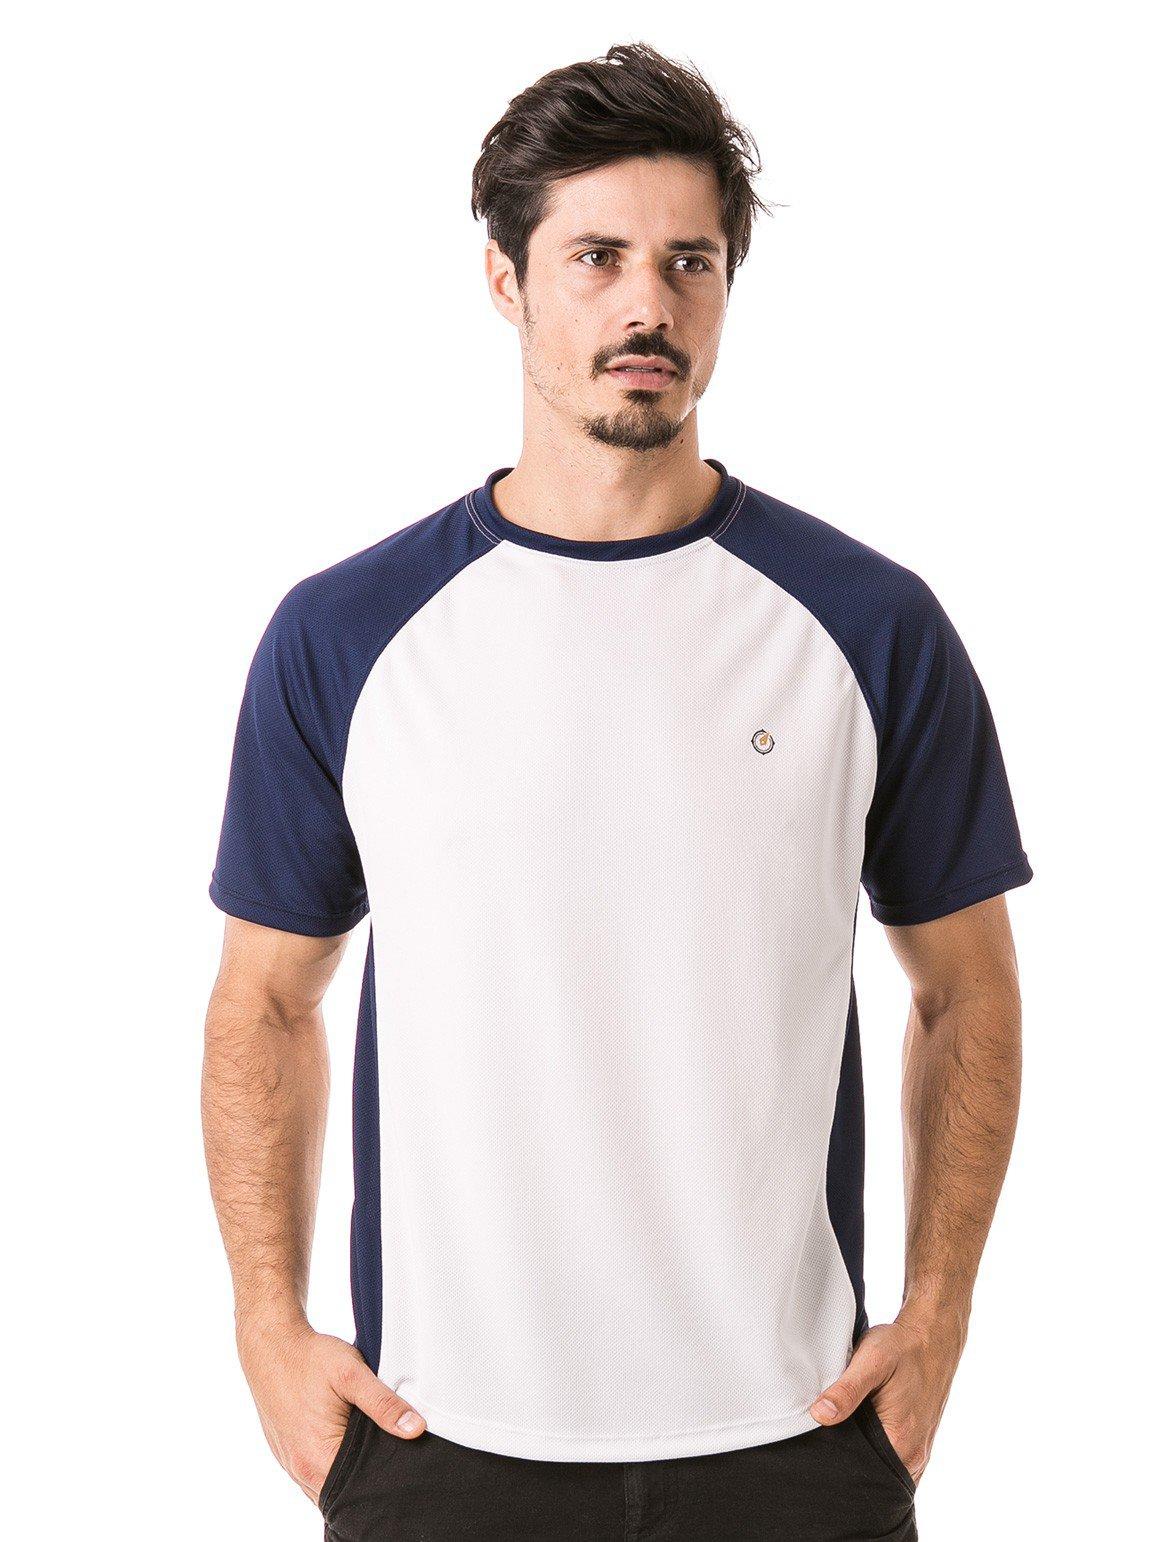 camisa masculina raglan gola redonda curta dry manga azul frente b